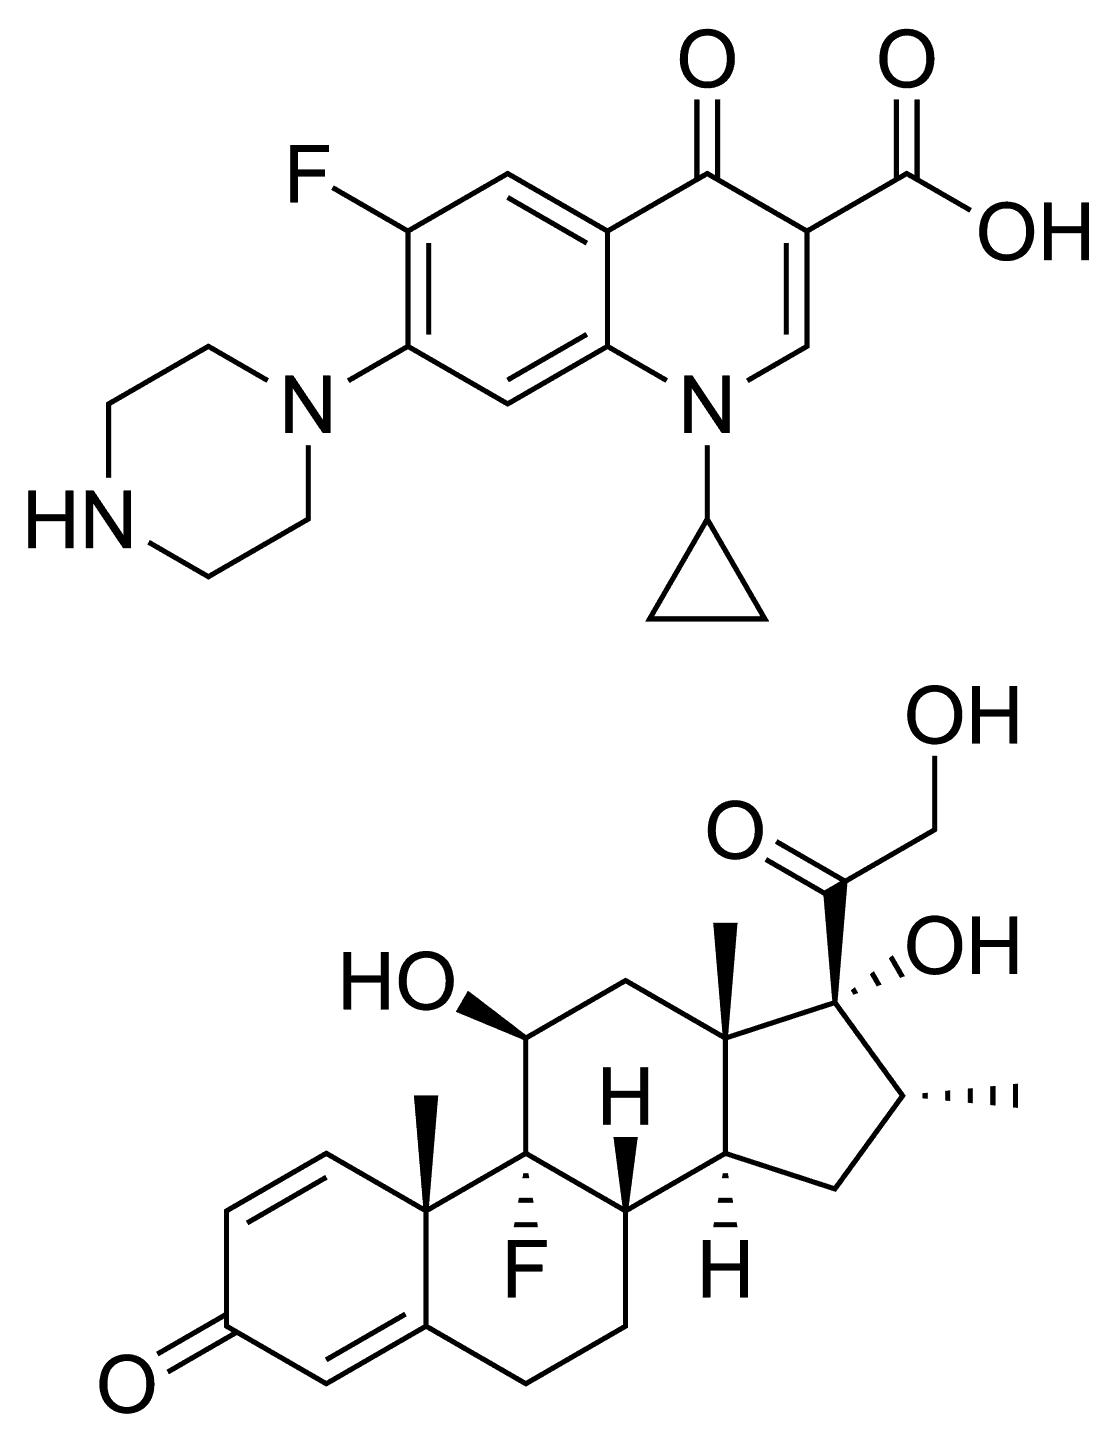 Levaquin (Levofloxacin Side Effects, Interactions, Warning)